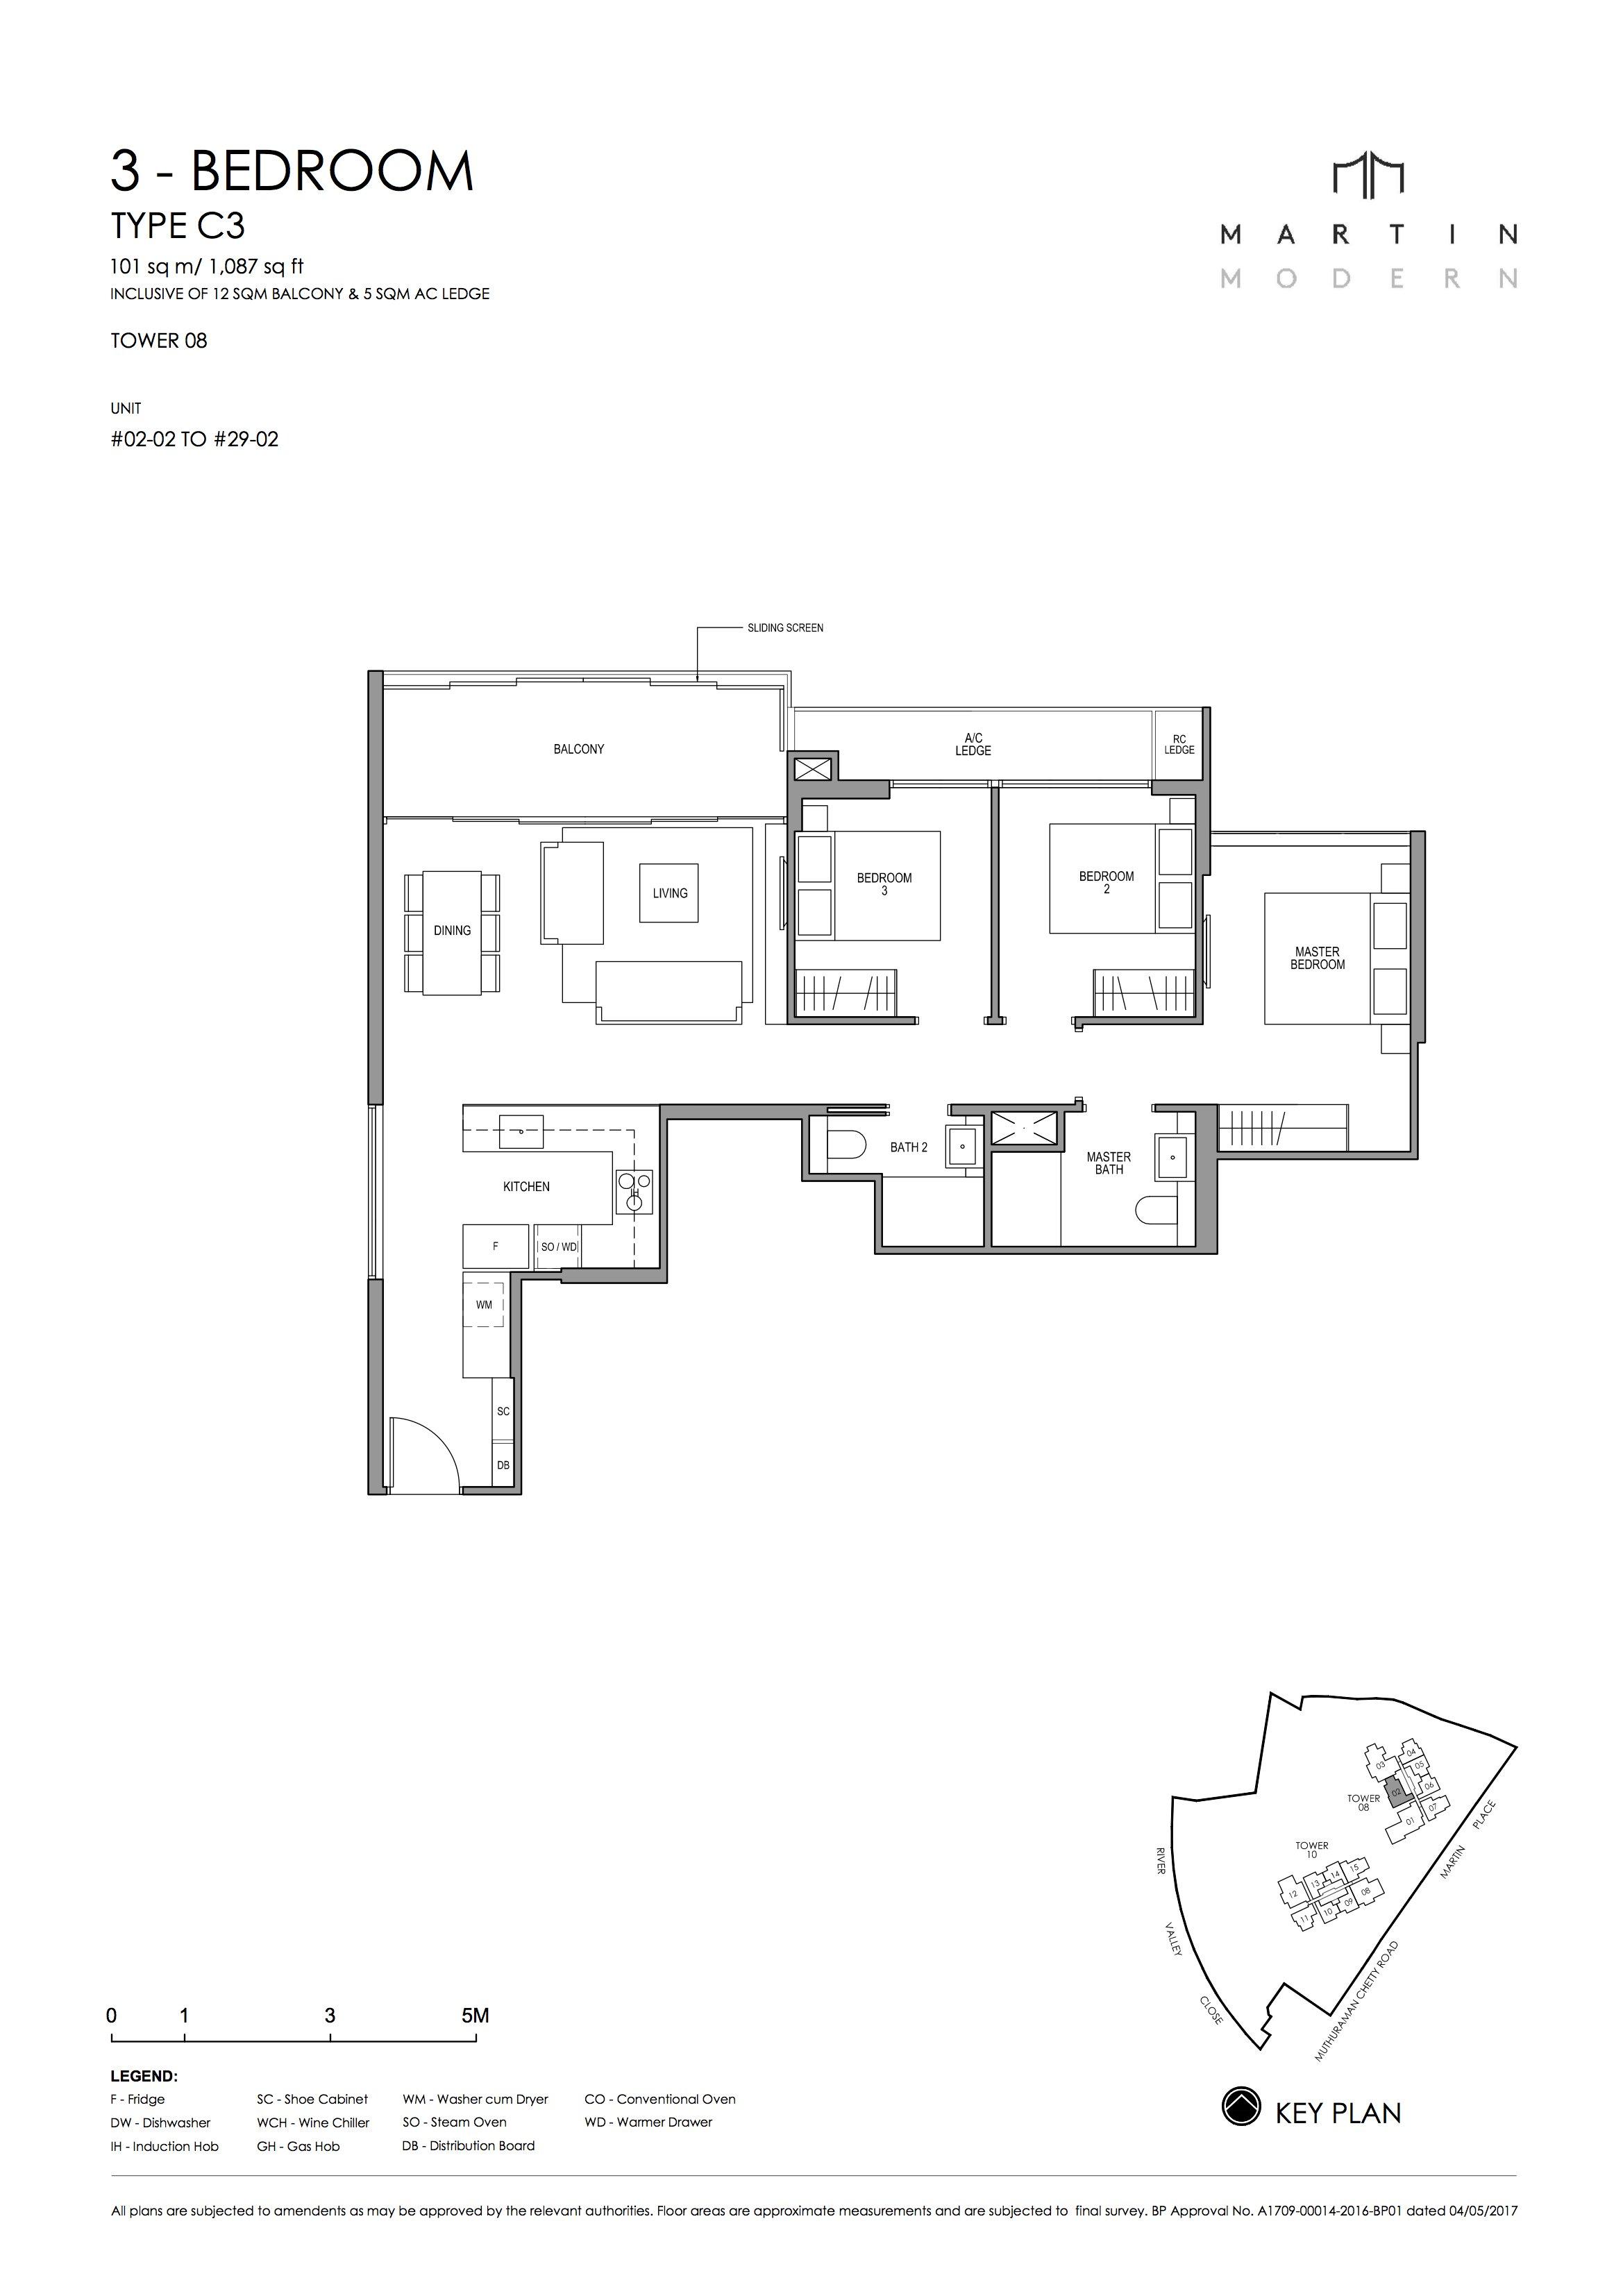 MARTIN MODERN 3-Bedroom TYPE C3